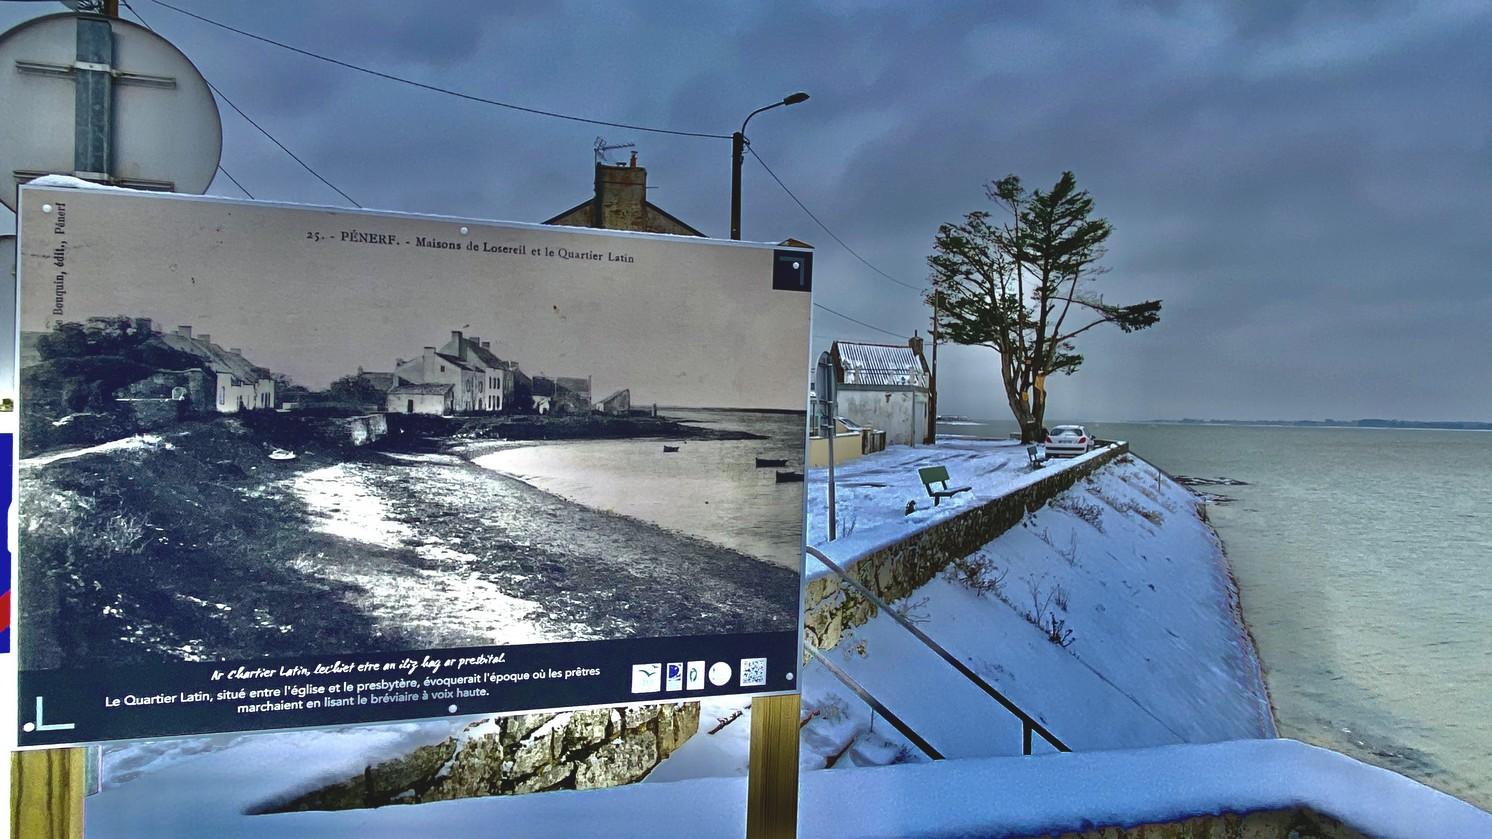 Penerf en Damgan sous la neige - morbihan bretagne©Philippe Jaquemin (22)